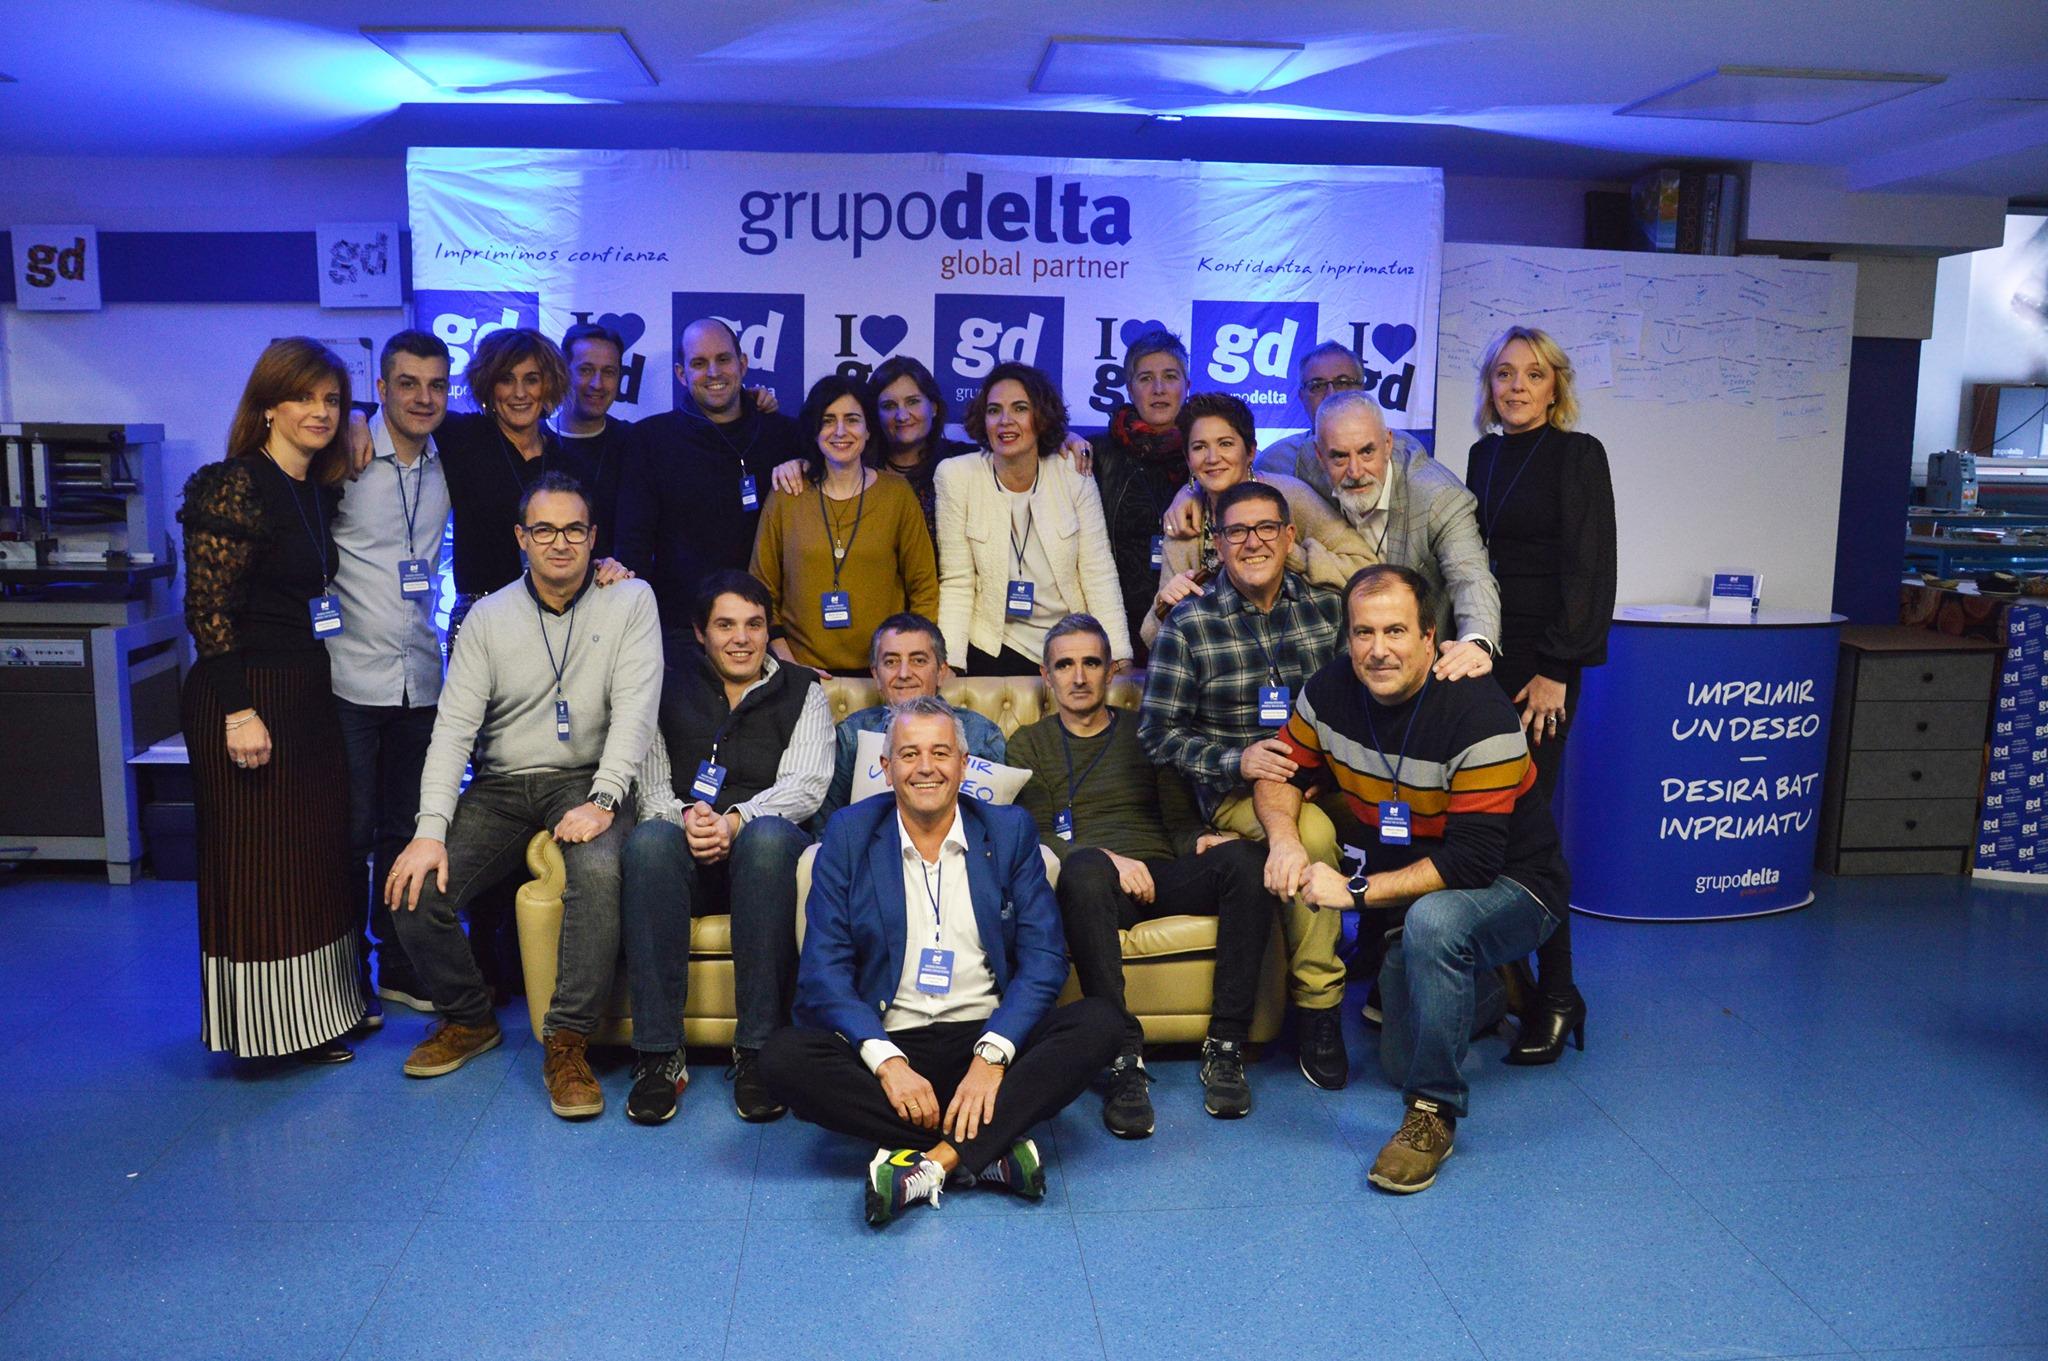 Brindando impresiones 2019, Grupo Delta Global Partner